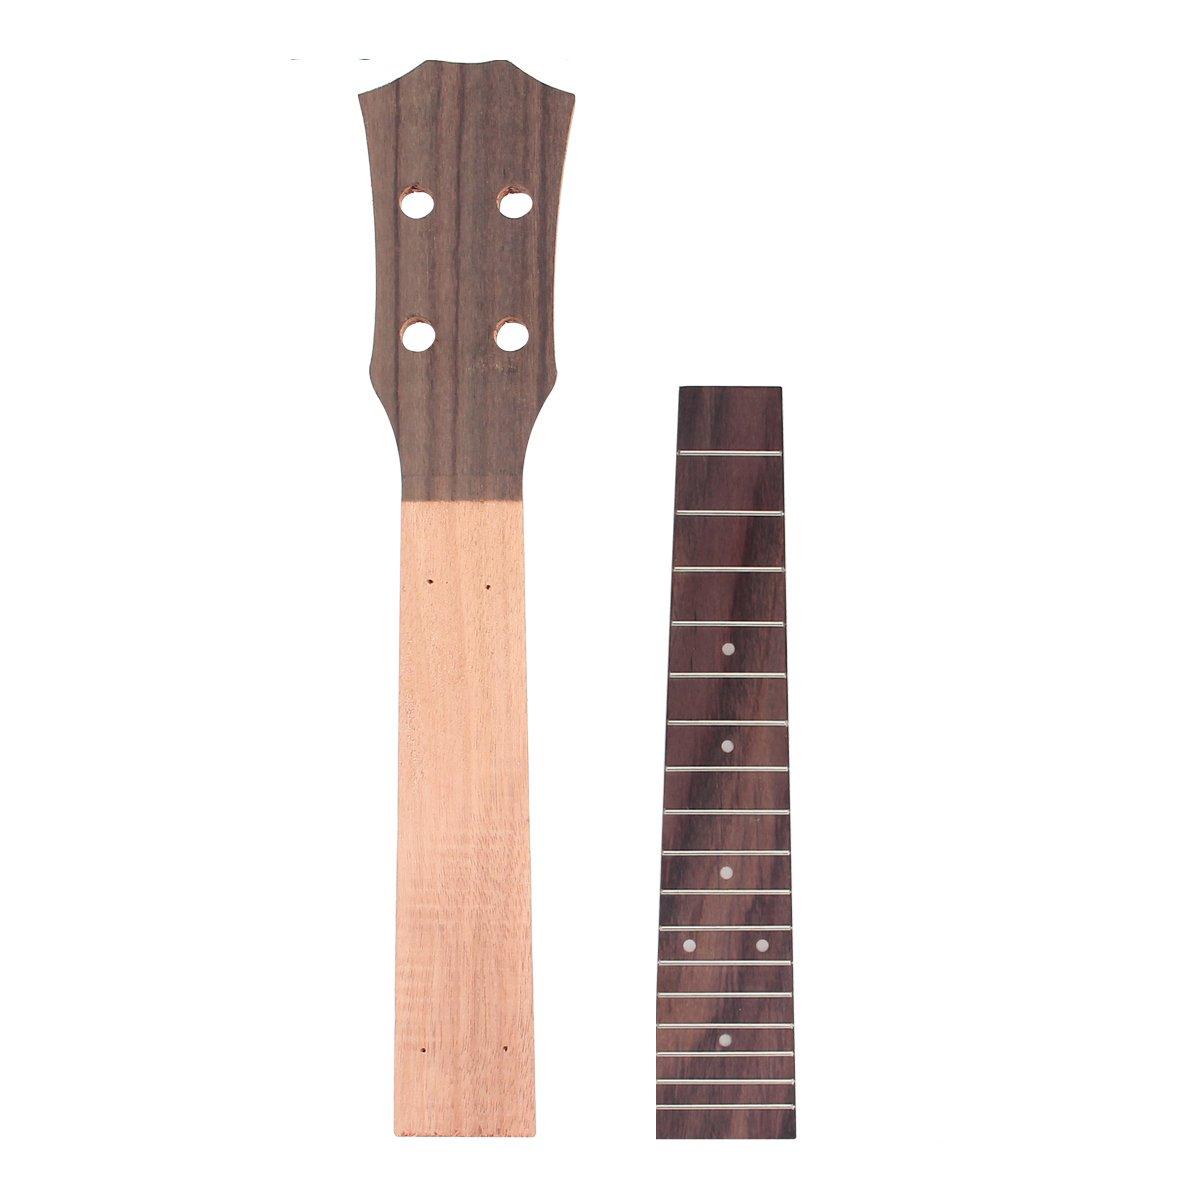 Stringed Instruments Ukulele Fretboard Concert Uke Hawaii Guitar Ukelele 23 Inch Fingerboard Rosewood Fretted